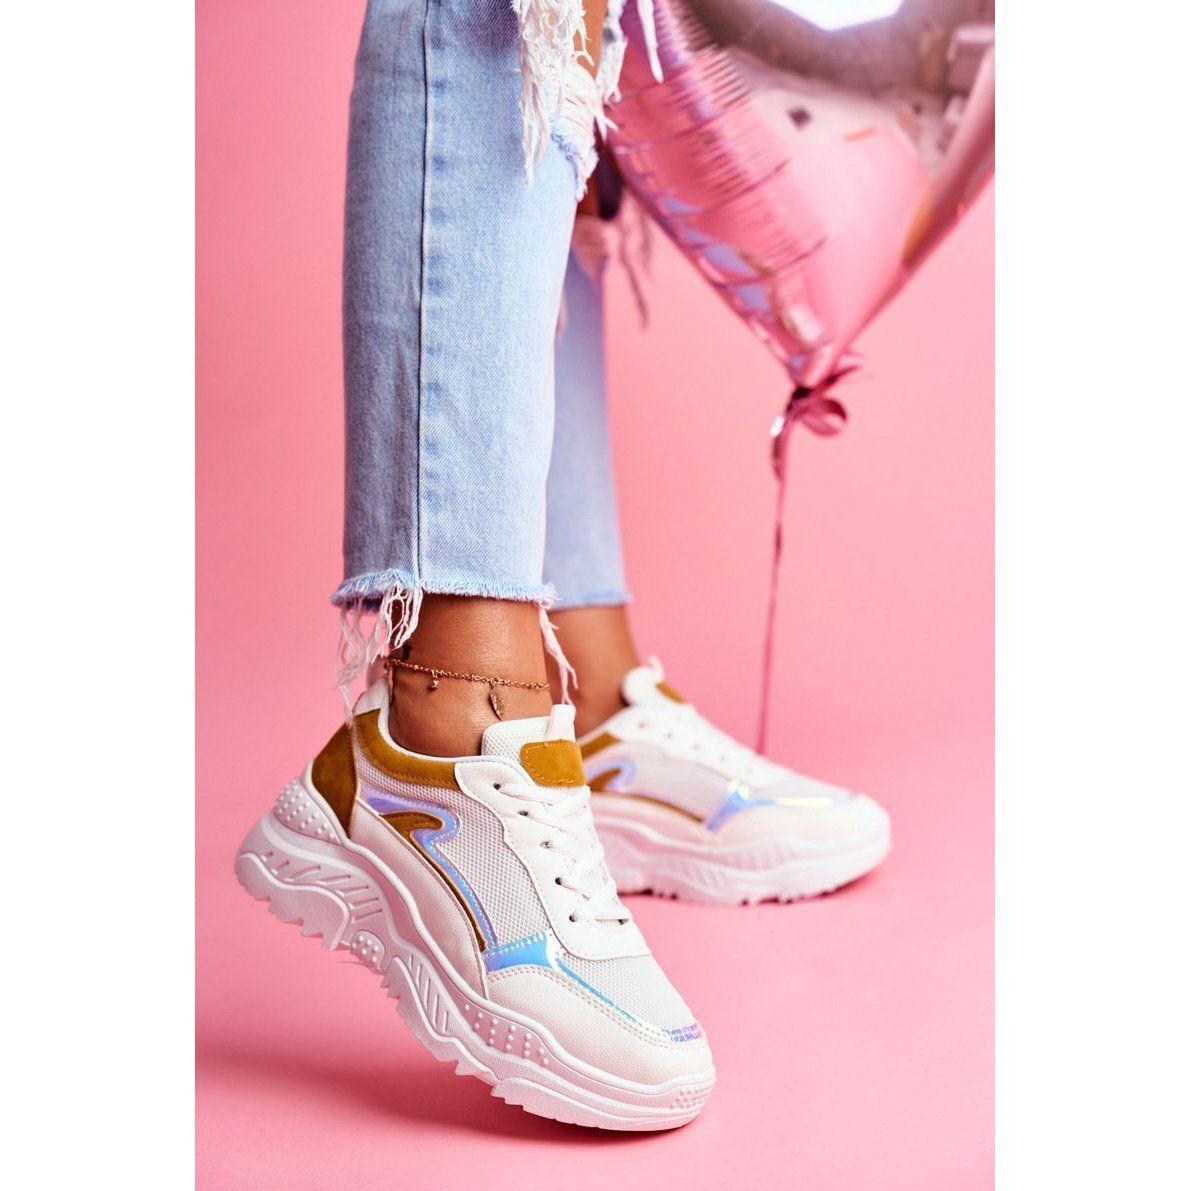 Bugo Sportowe Damskie Buty Zolto Biale Memory Zolte Sneakers Nike Nike Huarache Fashion